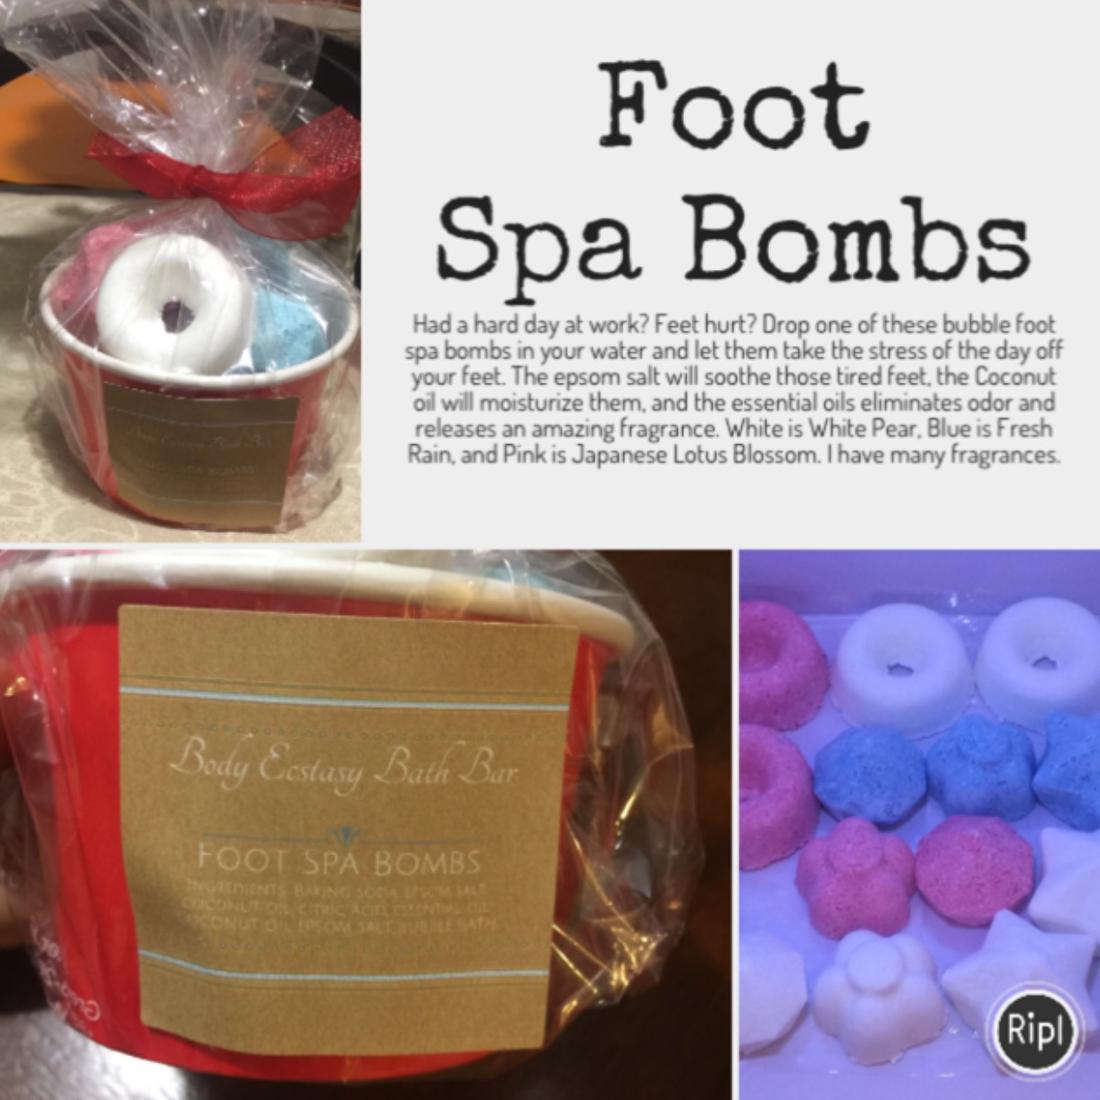 Foot Spa Bombs